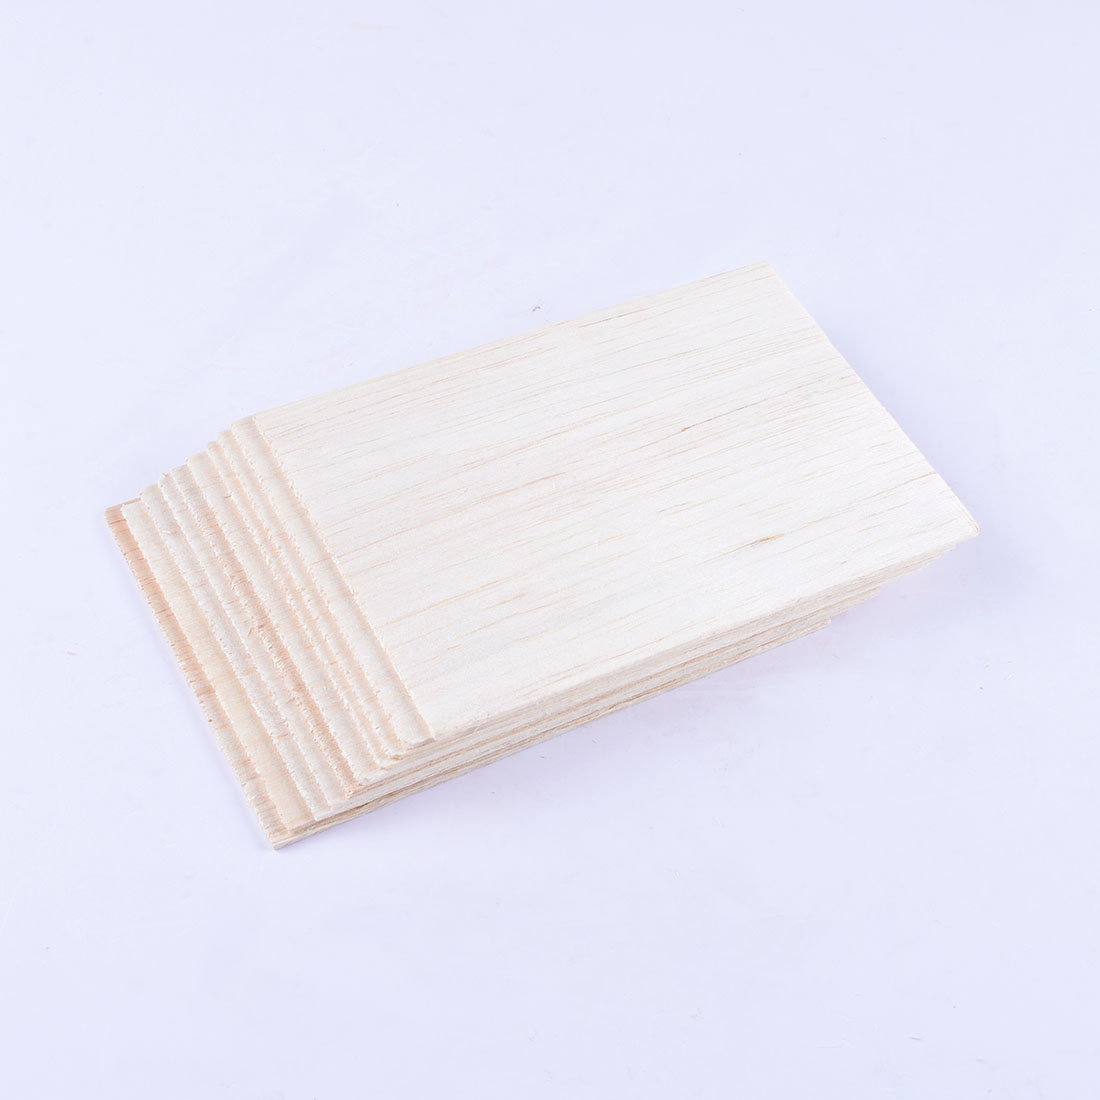 10pcs 100x150x2mm Thin Wood Board Panel Plaque For DIY Handmade Arts Craft Decor Building Model Materials